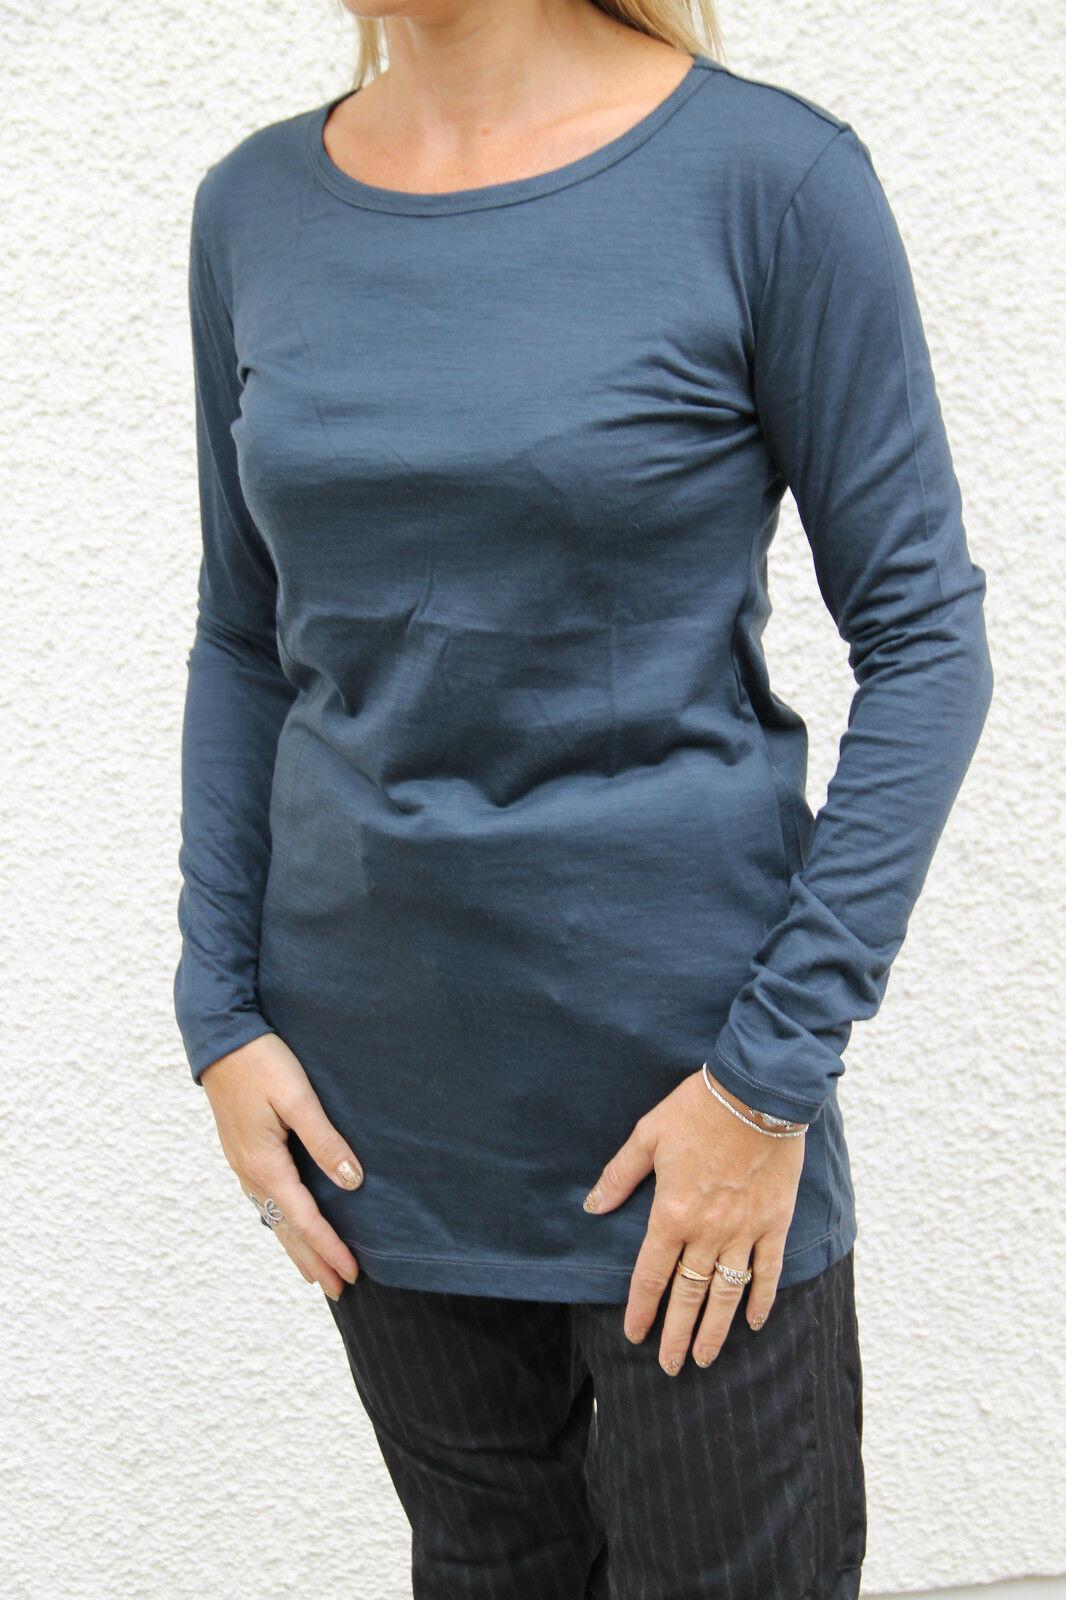 Tunique pull laine extra fine bleu M&F GIRBAUD hanacces T 42 PRIX BOUTIQUE